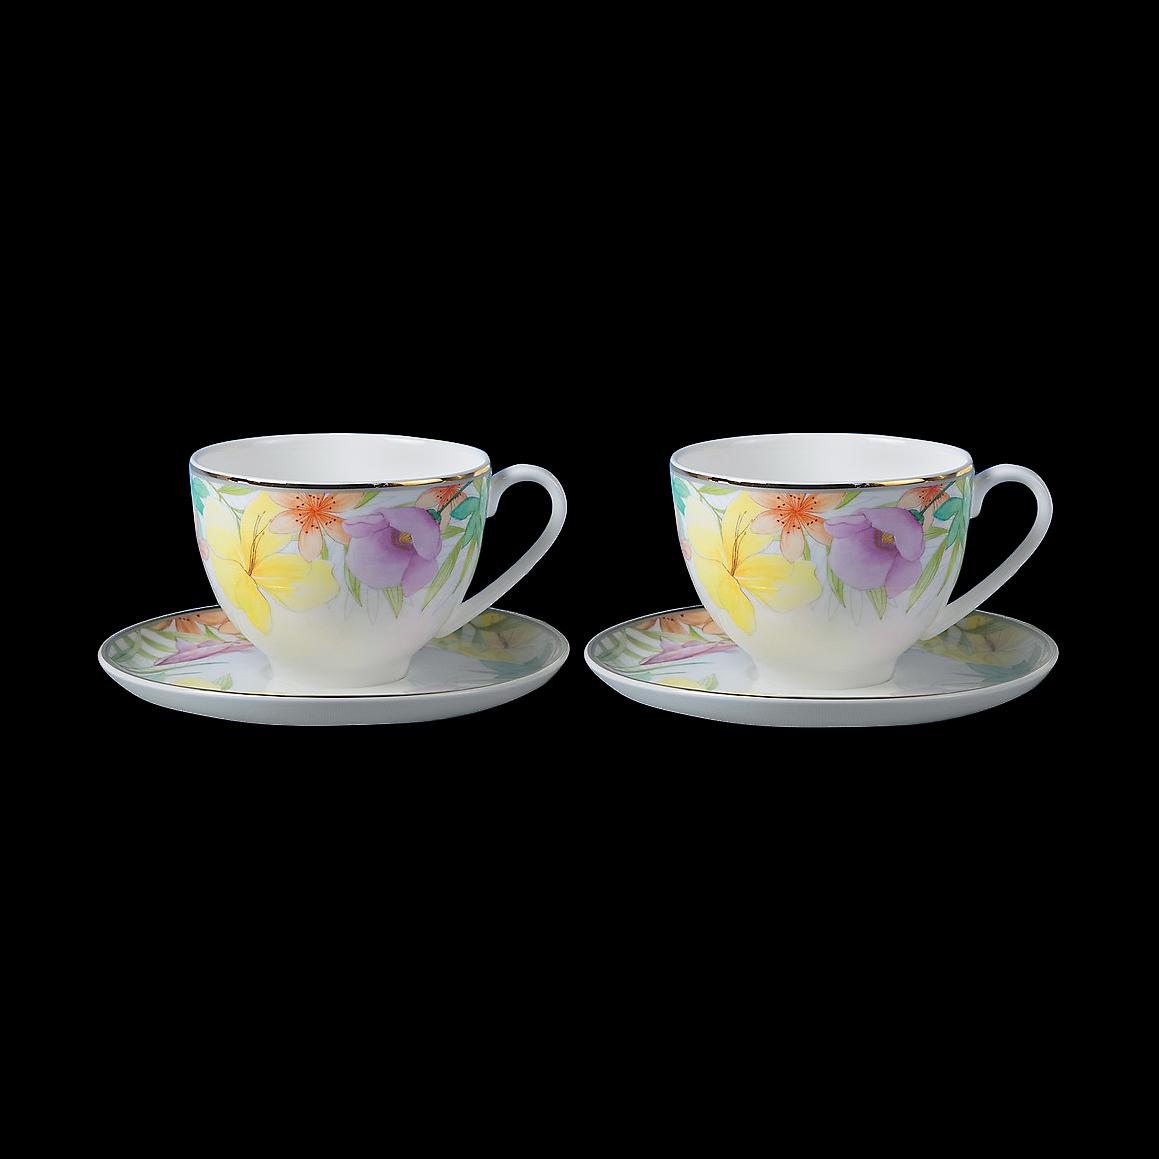 Набор чайный Hankook/Prouna Скарф на 2 персоны